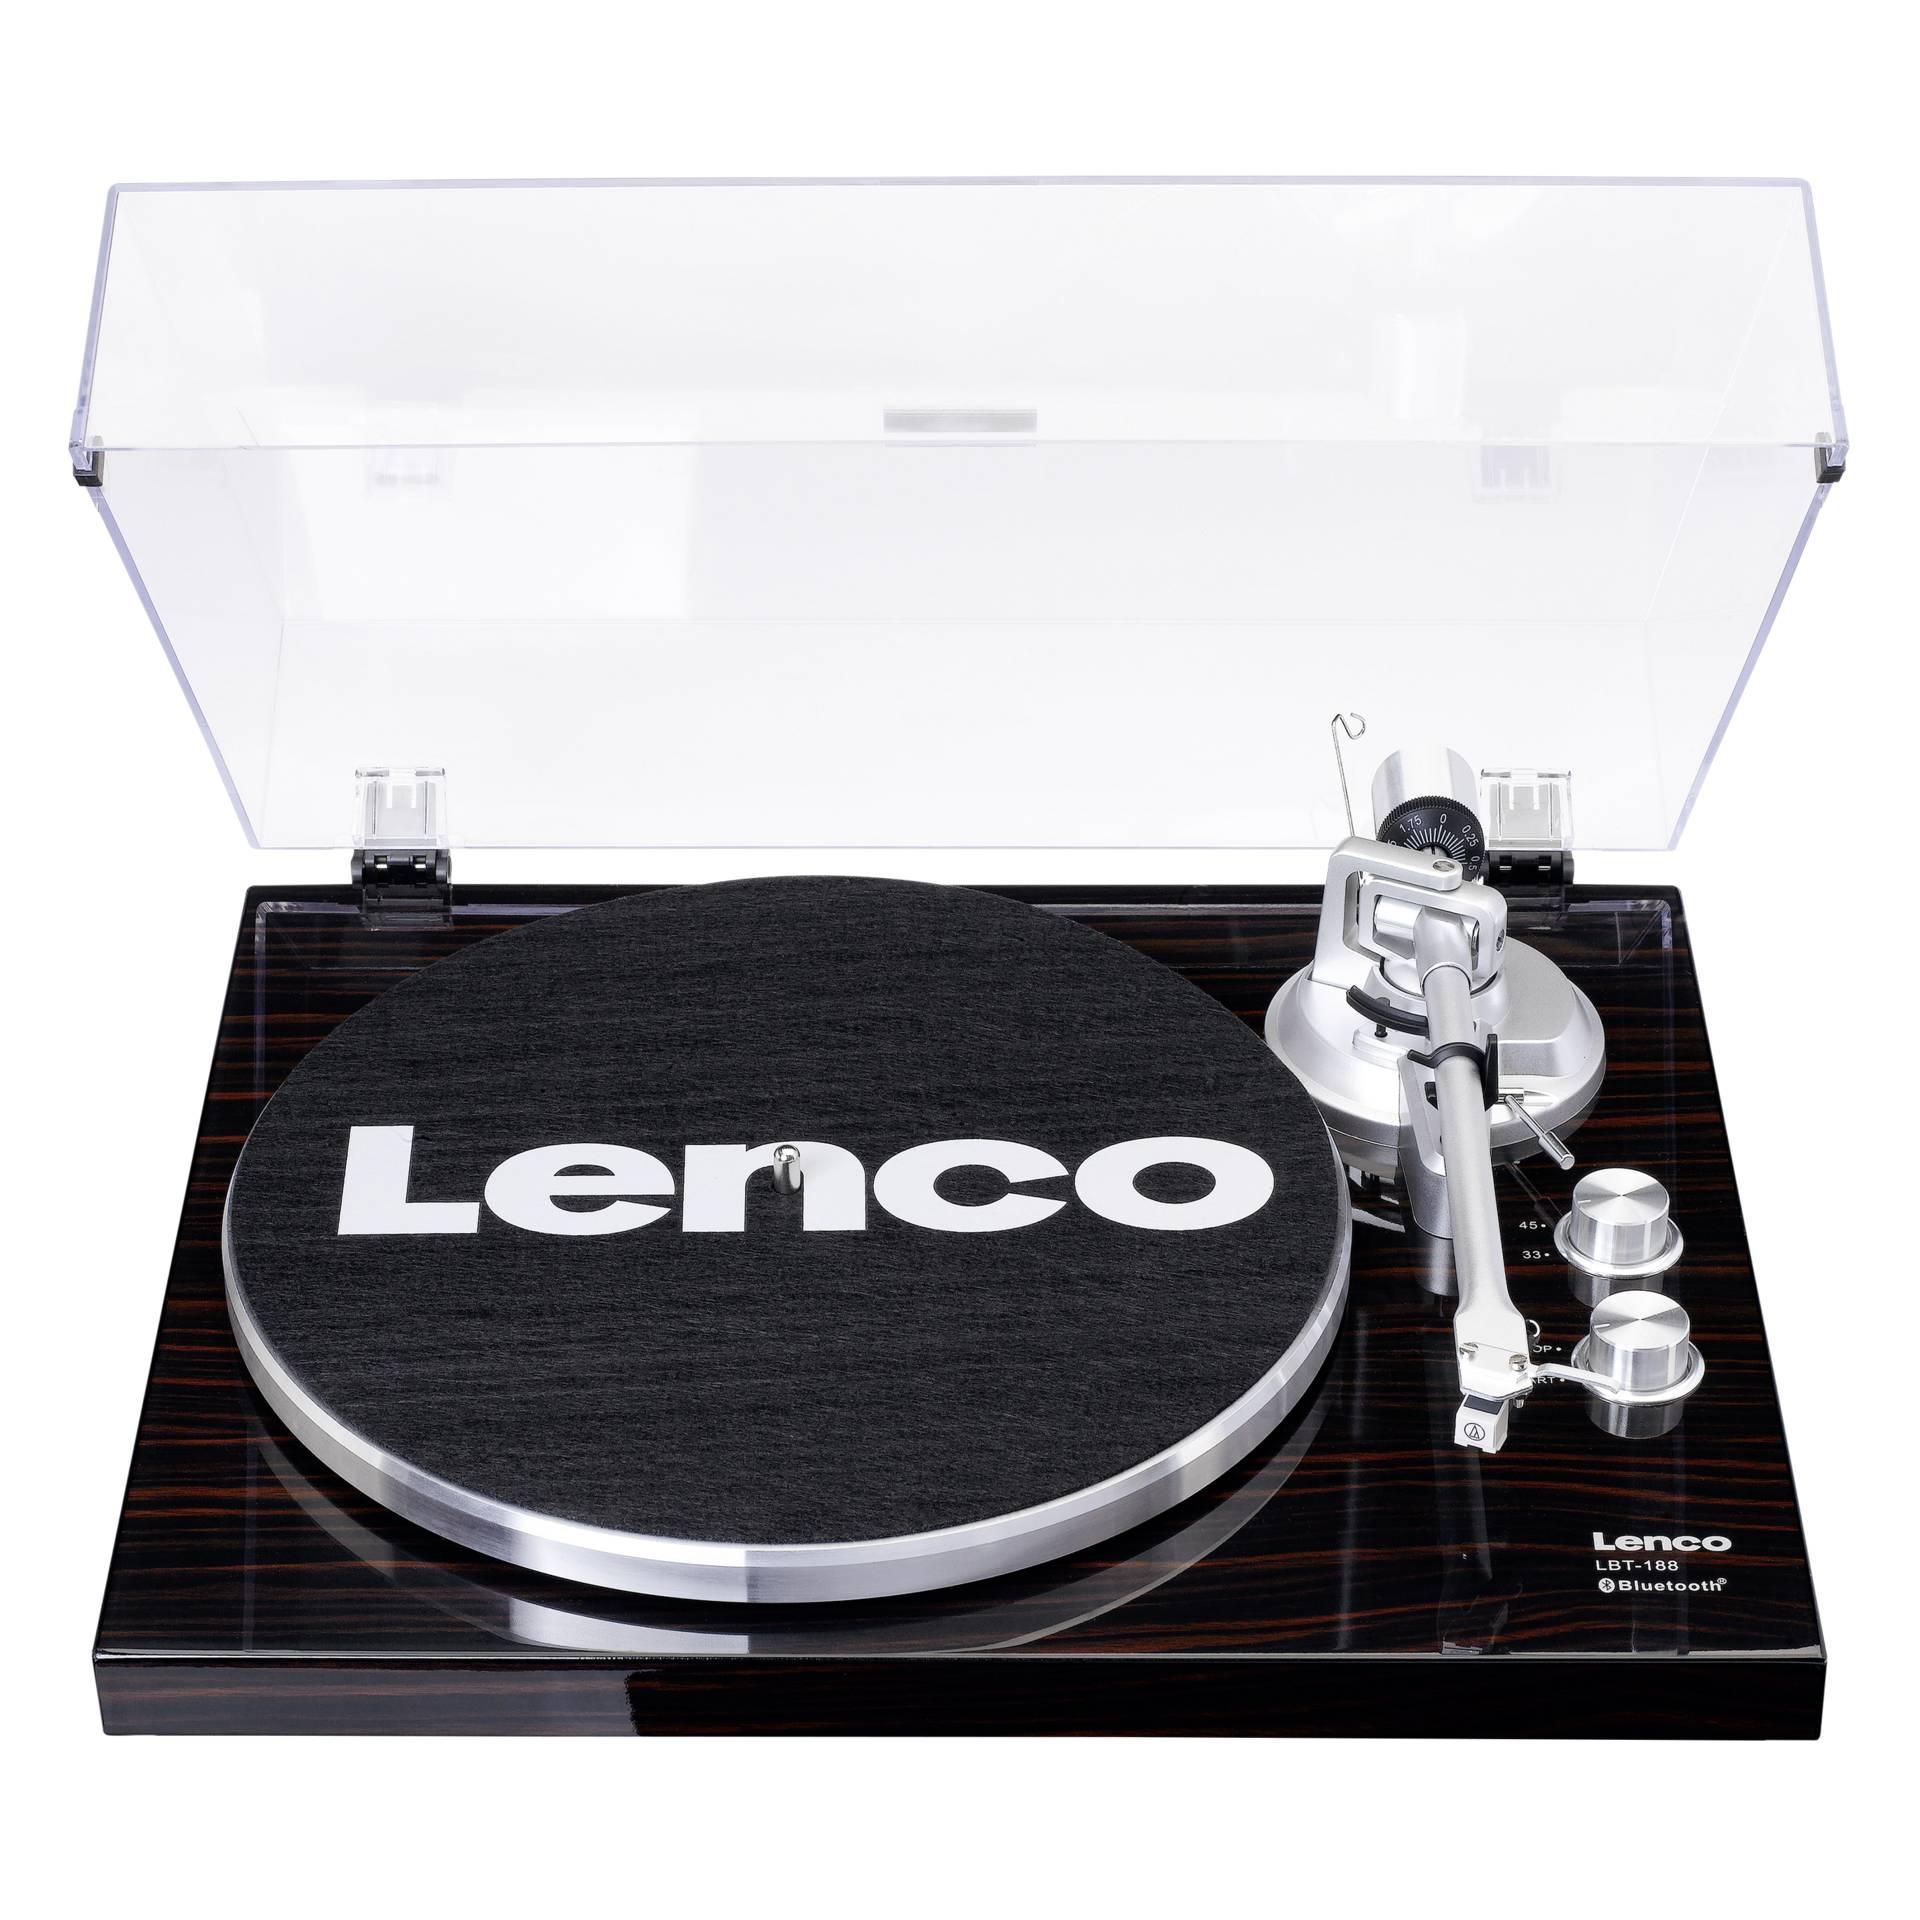 Lenco LBT-188 Walnut